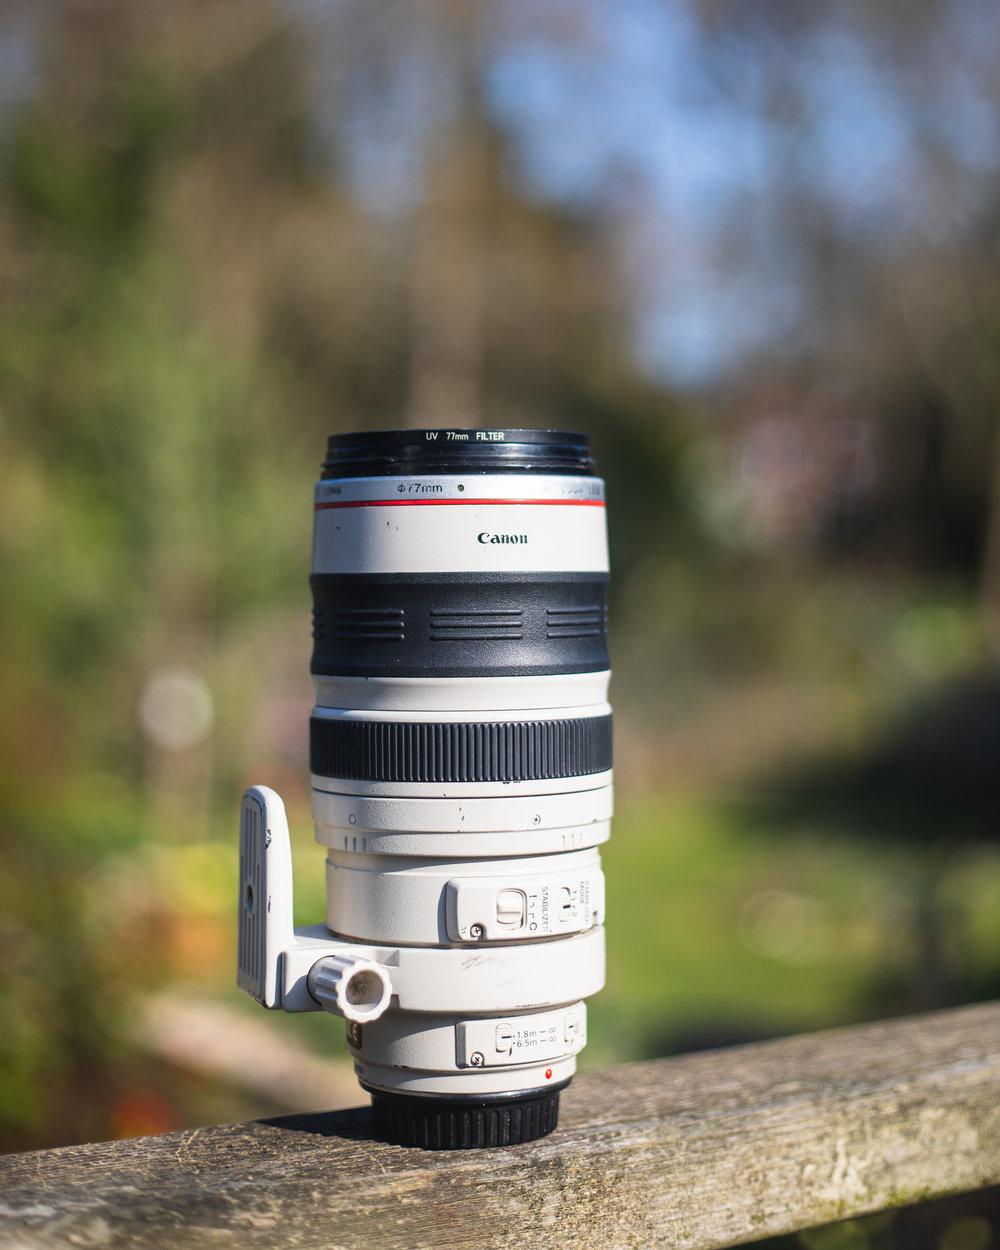 Telephoto Lens - Canon 100-400mm